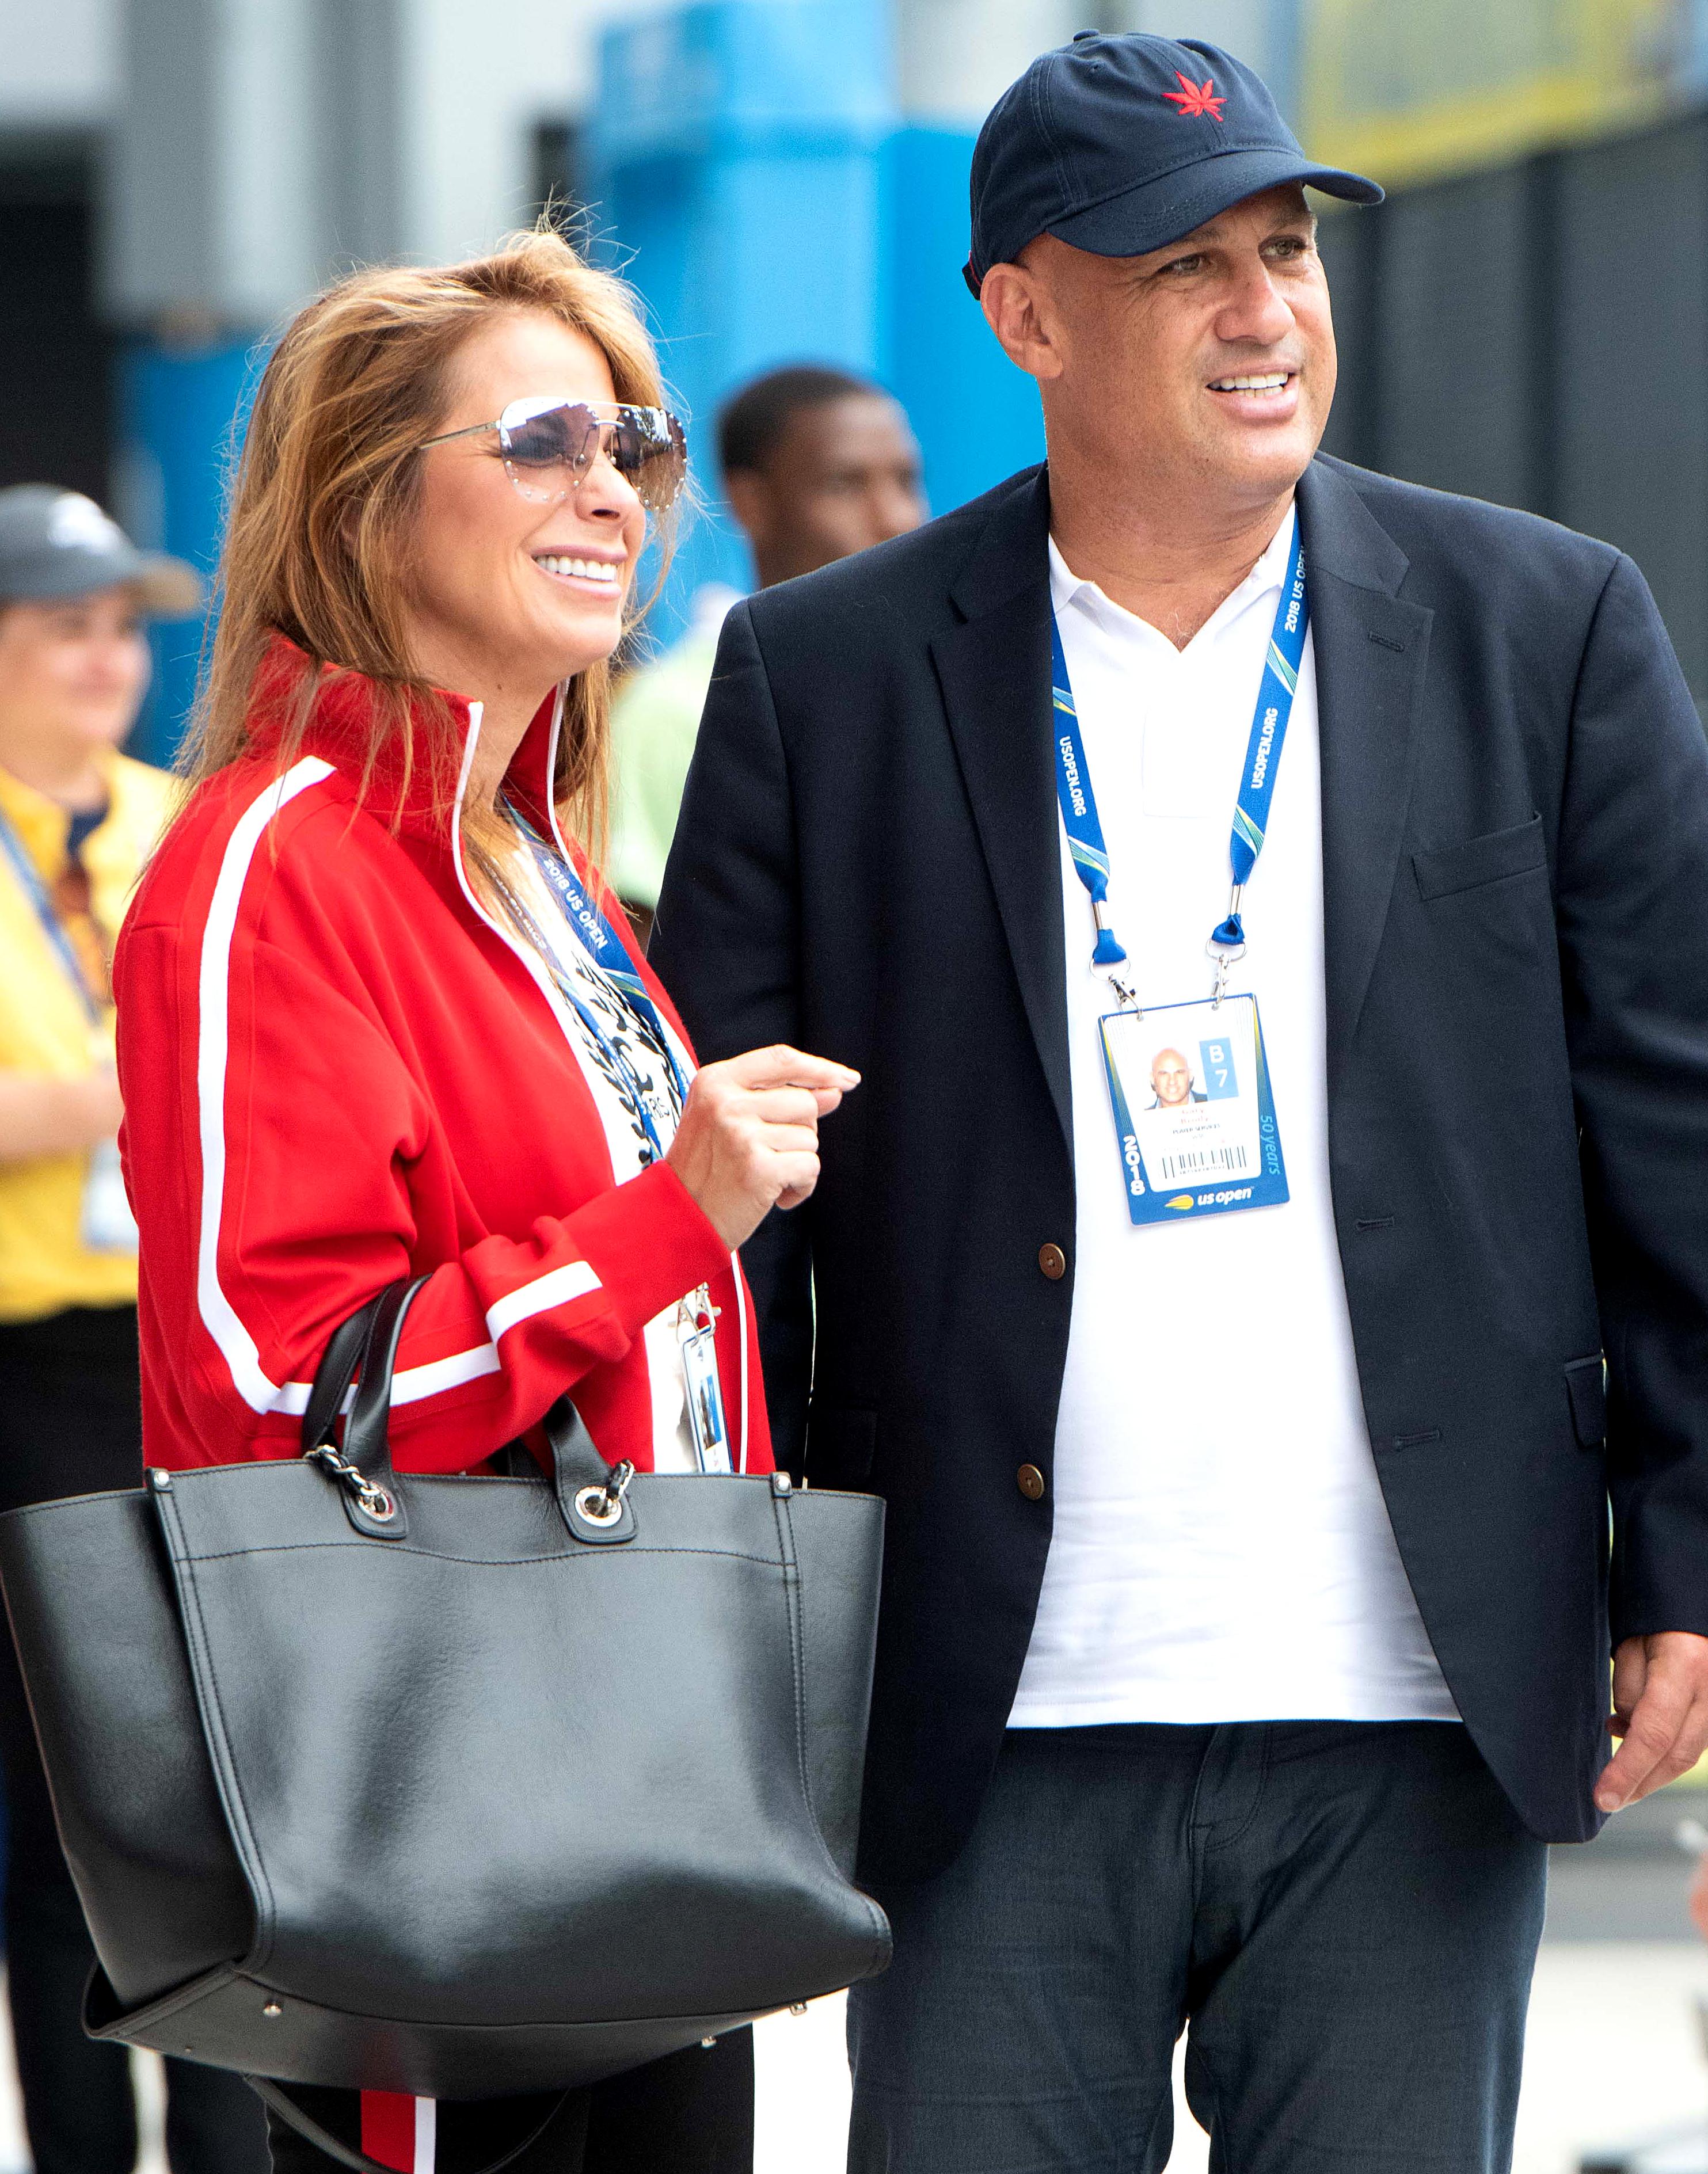 Are Wedding Bells in Jill Zarin and Boyfriend Gary Brody's Future? - Jill Zarin and Gary Brody at the US Open on September 7, 2018 in New York City.